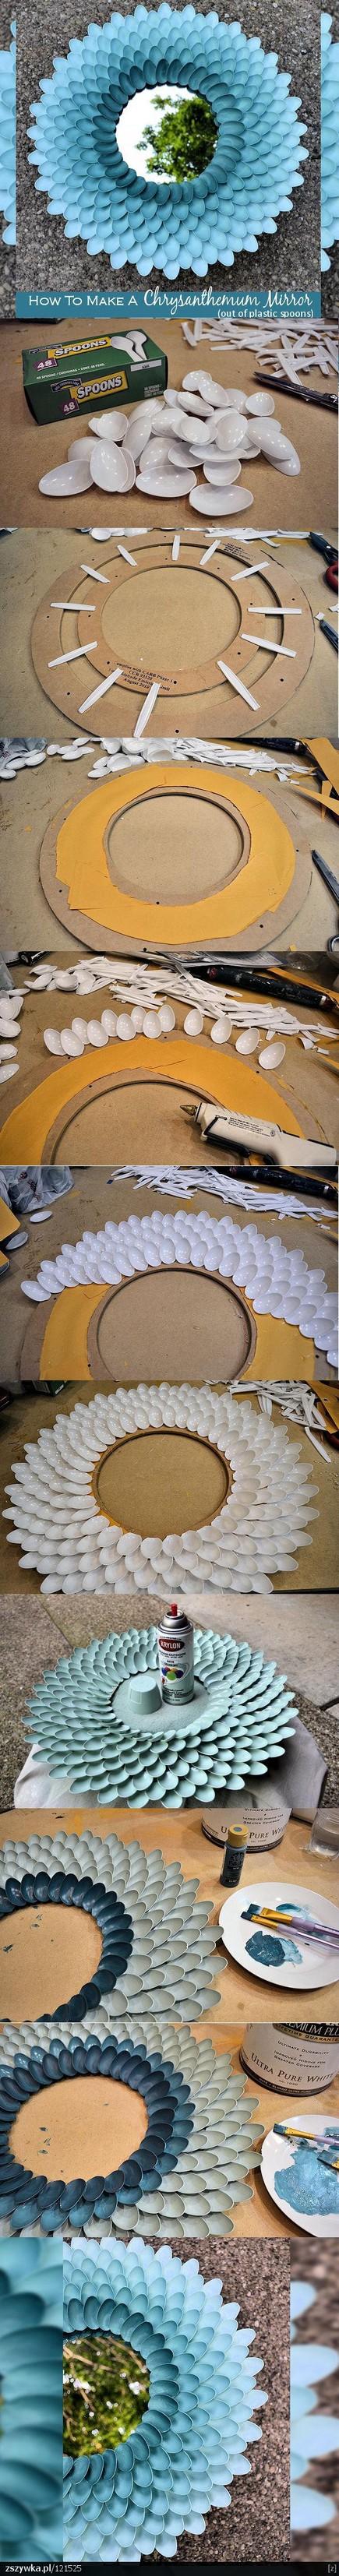 plastic spoons into chrysanthemum mirror